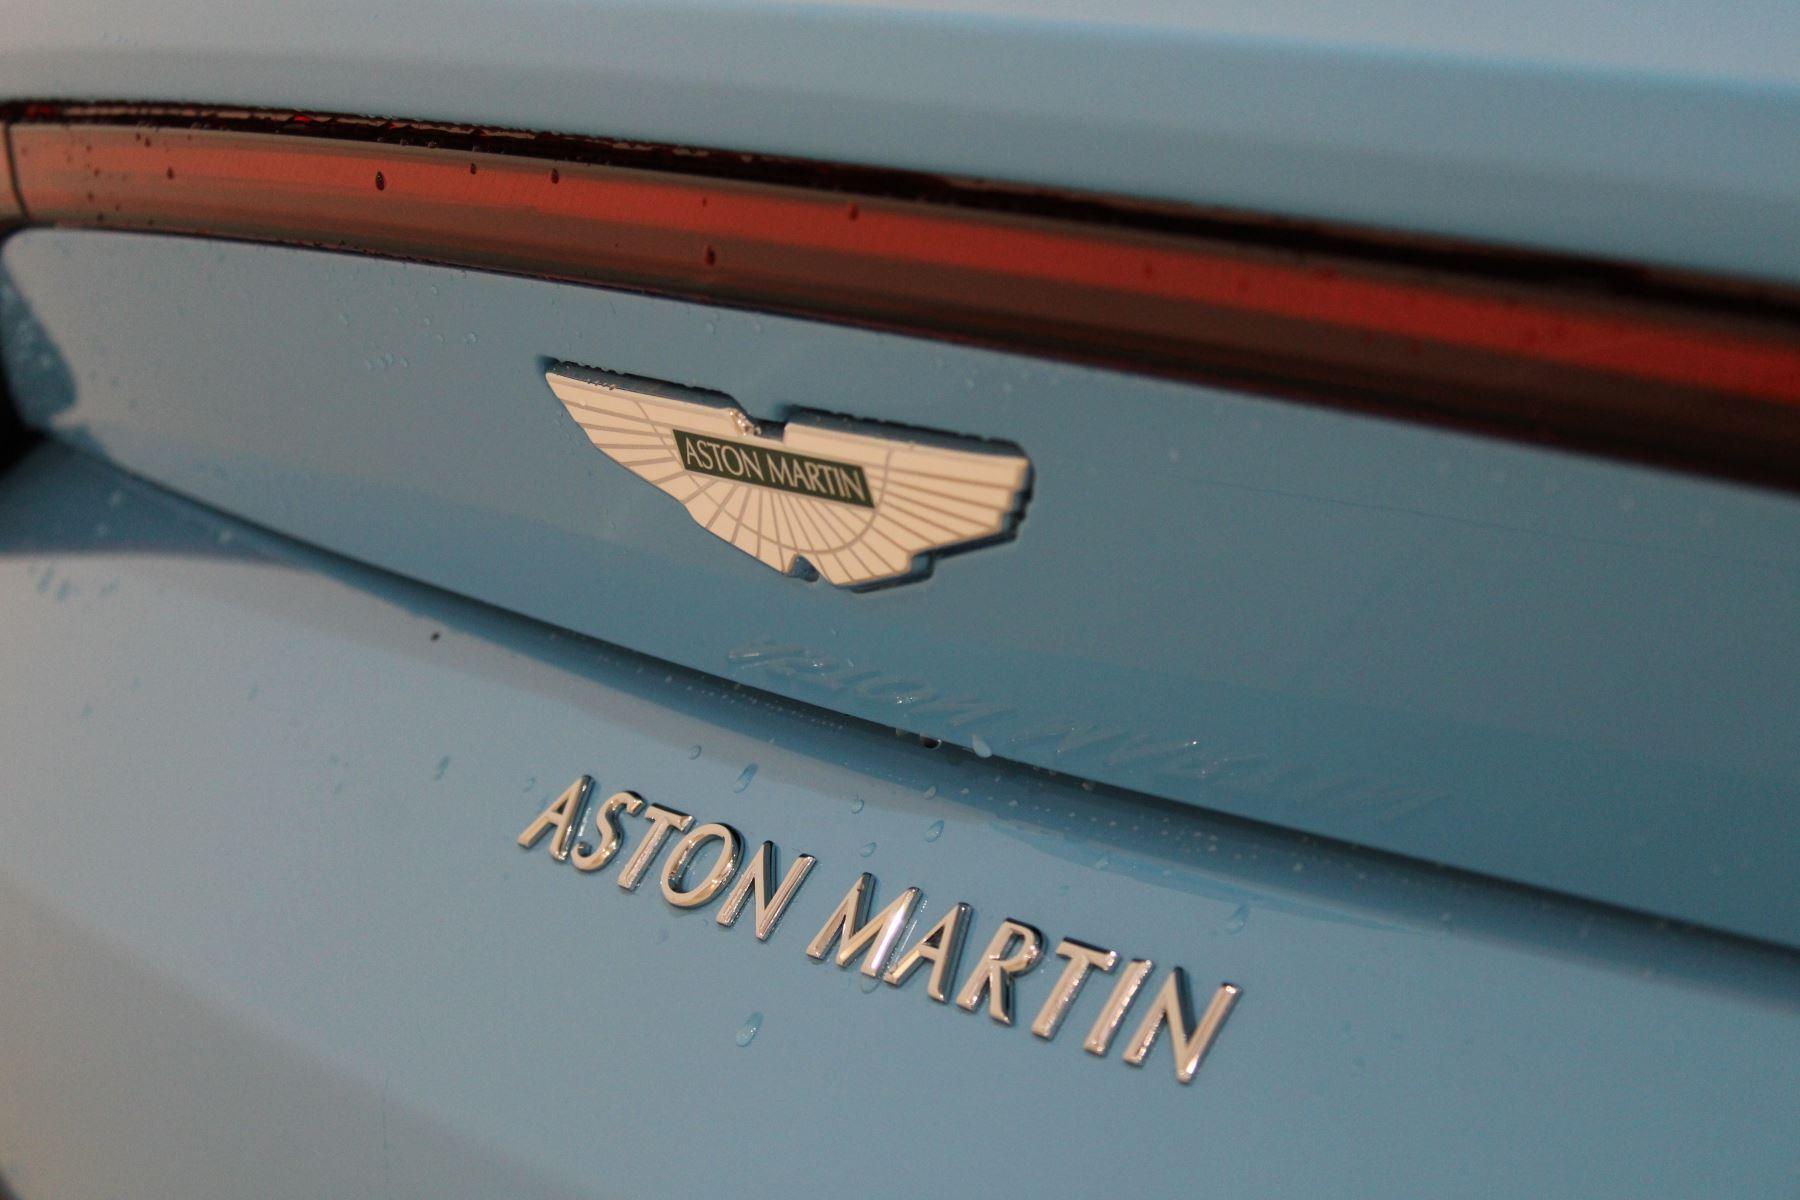 Aston Martin New Vantage 2dr image 11